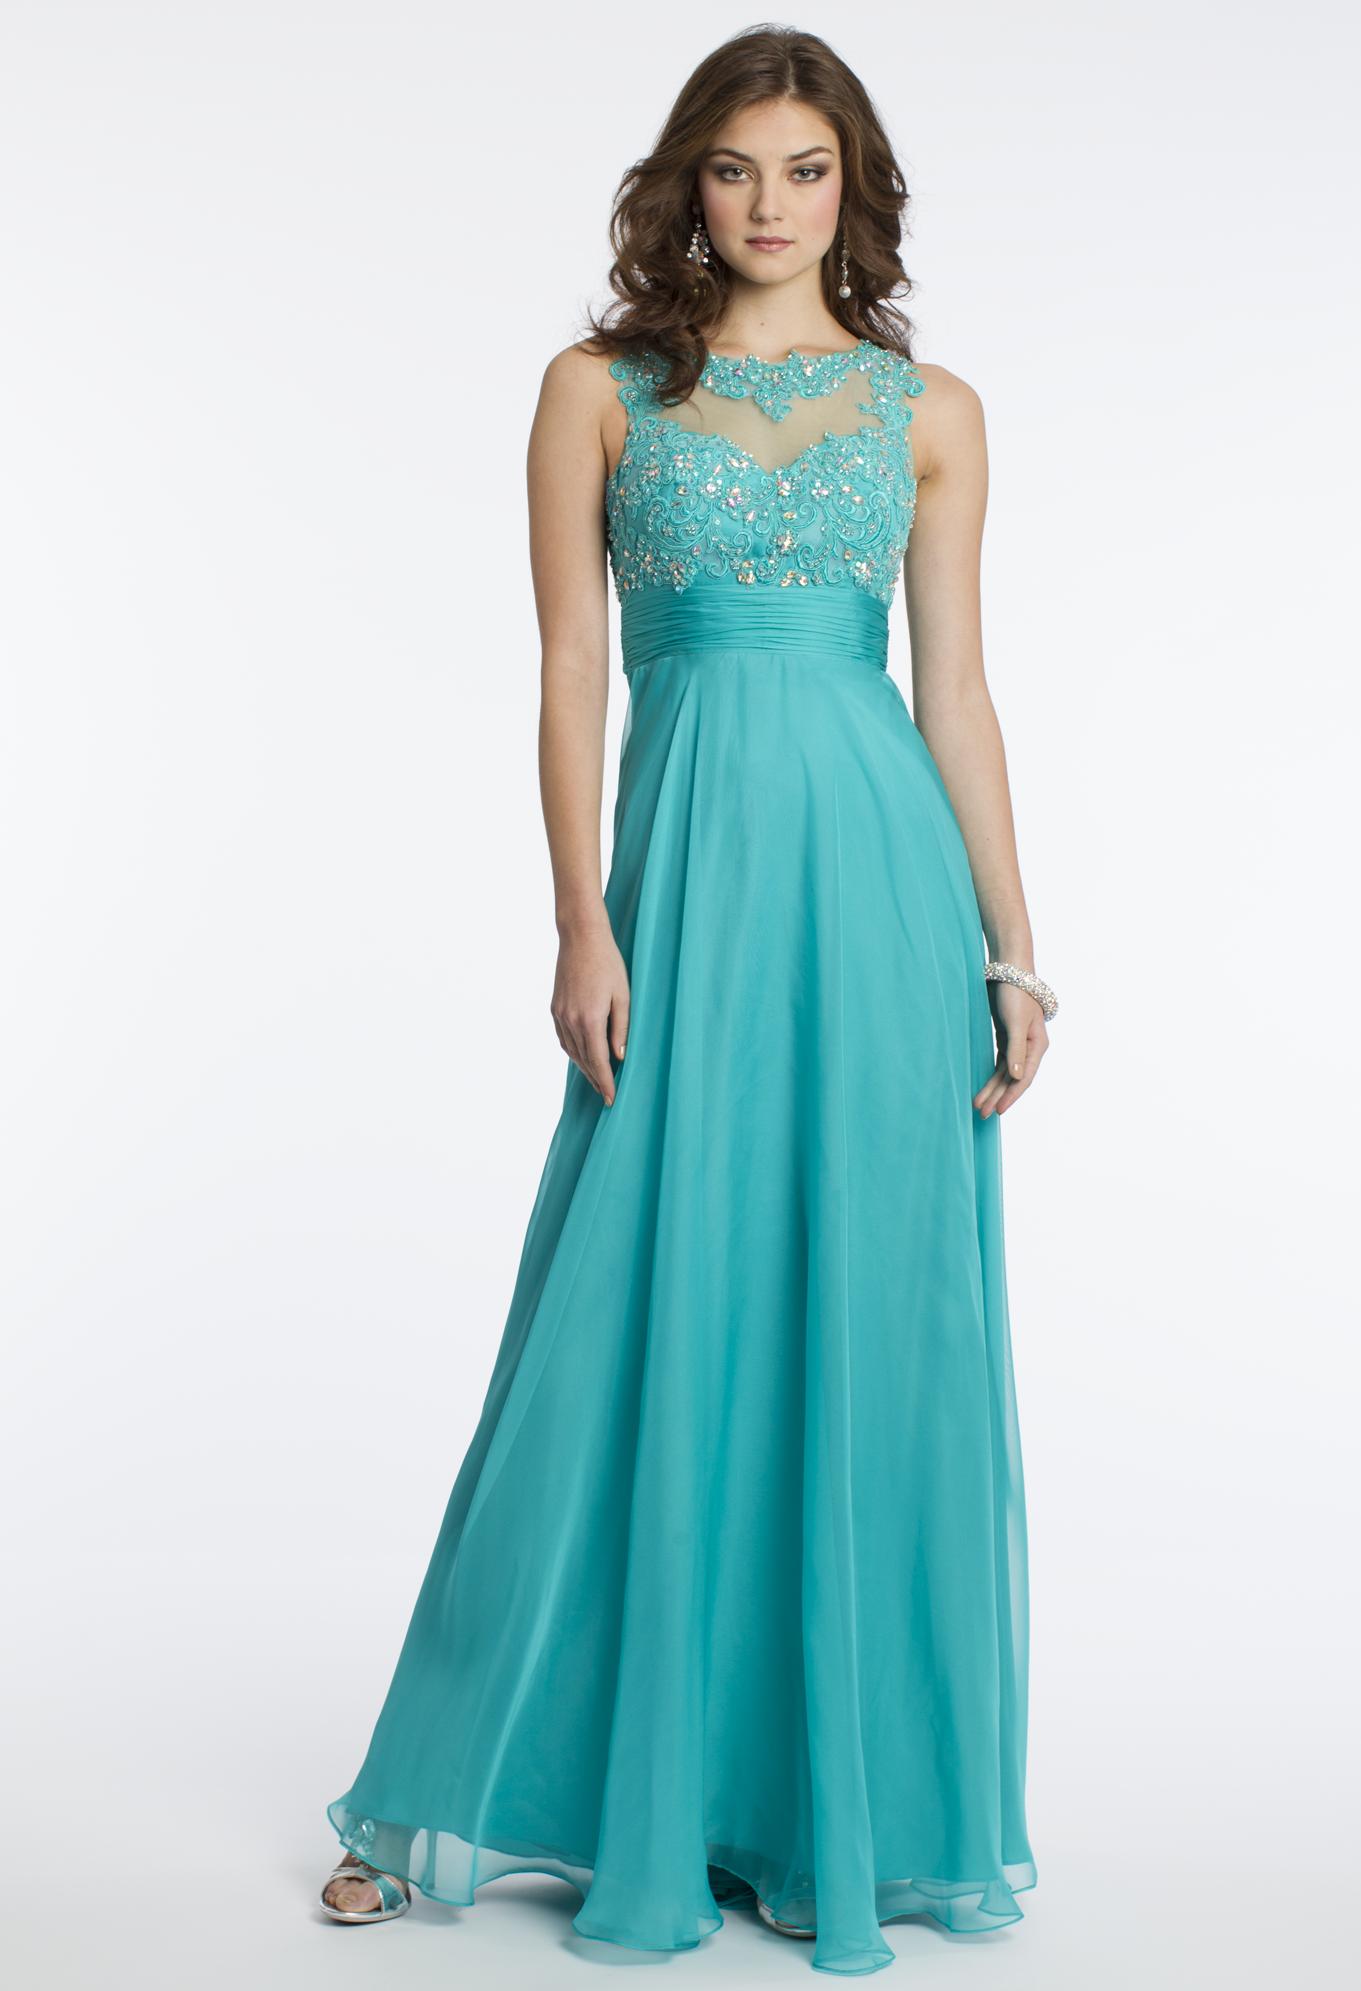 Camille La Vie Chiffon Illusion Neck Prom Dress with Empire Waist ...